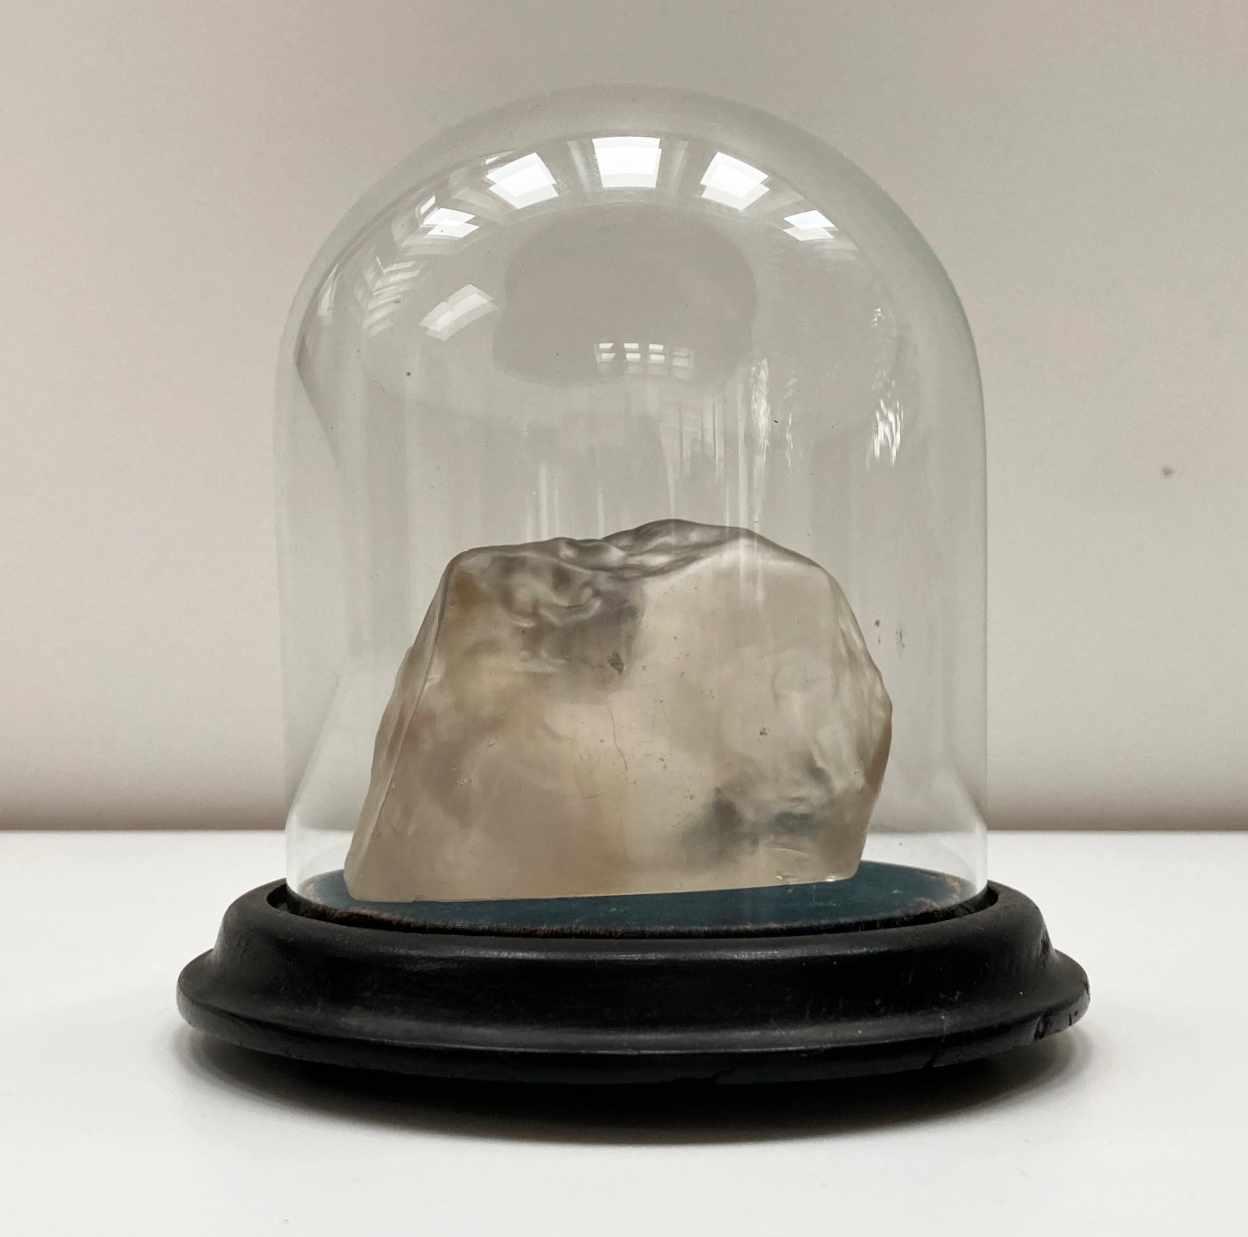 Edwardian Glass Replica of the Uncut Cullinan Diamond – James R Gregory